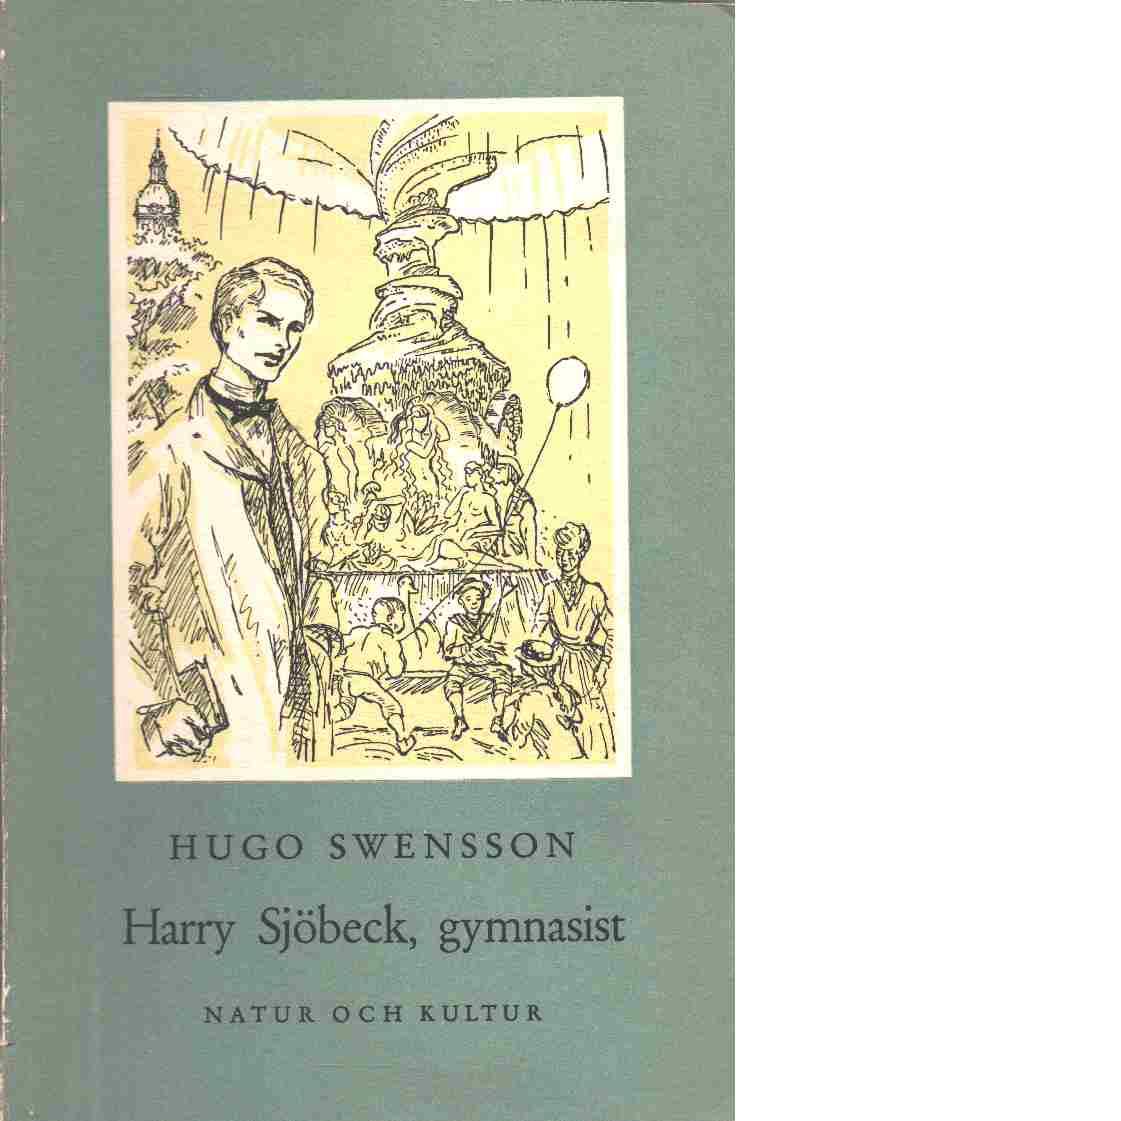 Harry Sjöbeck, gymnasist - Swensson, Hugo